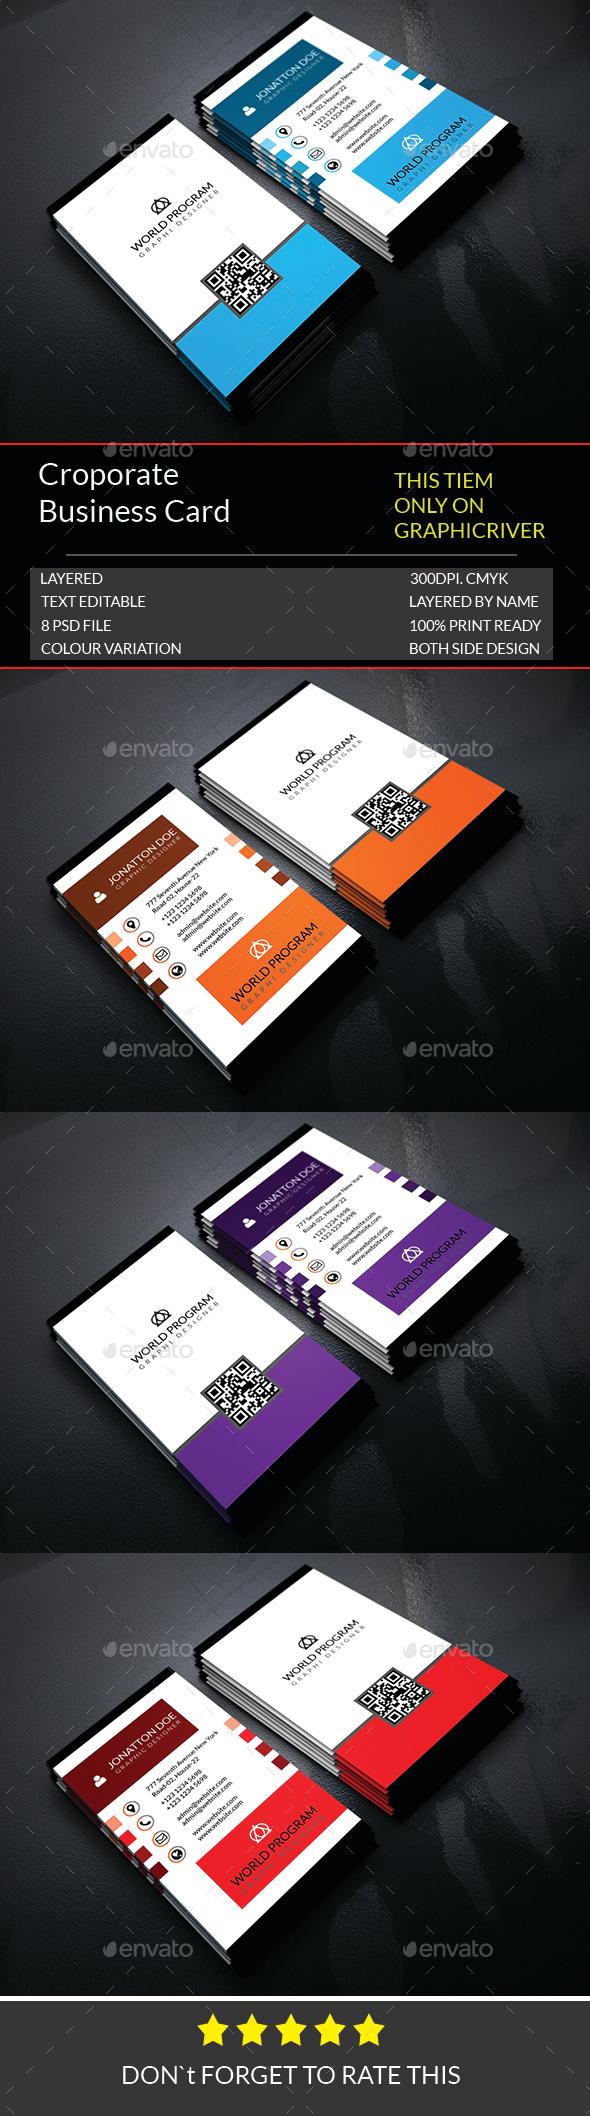 Corporate Business Card Template.177 - Corporate Business Cards